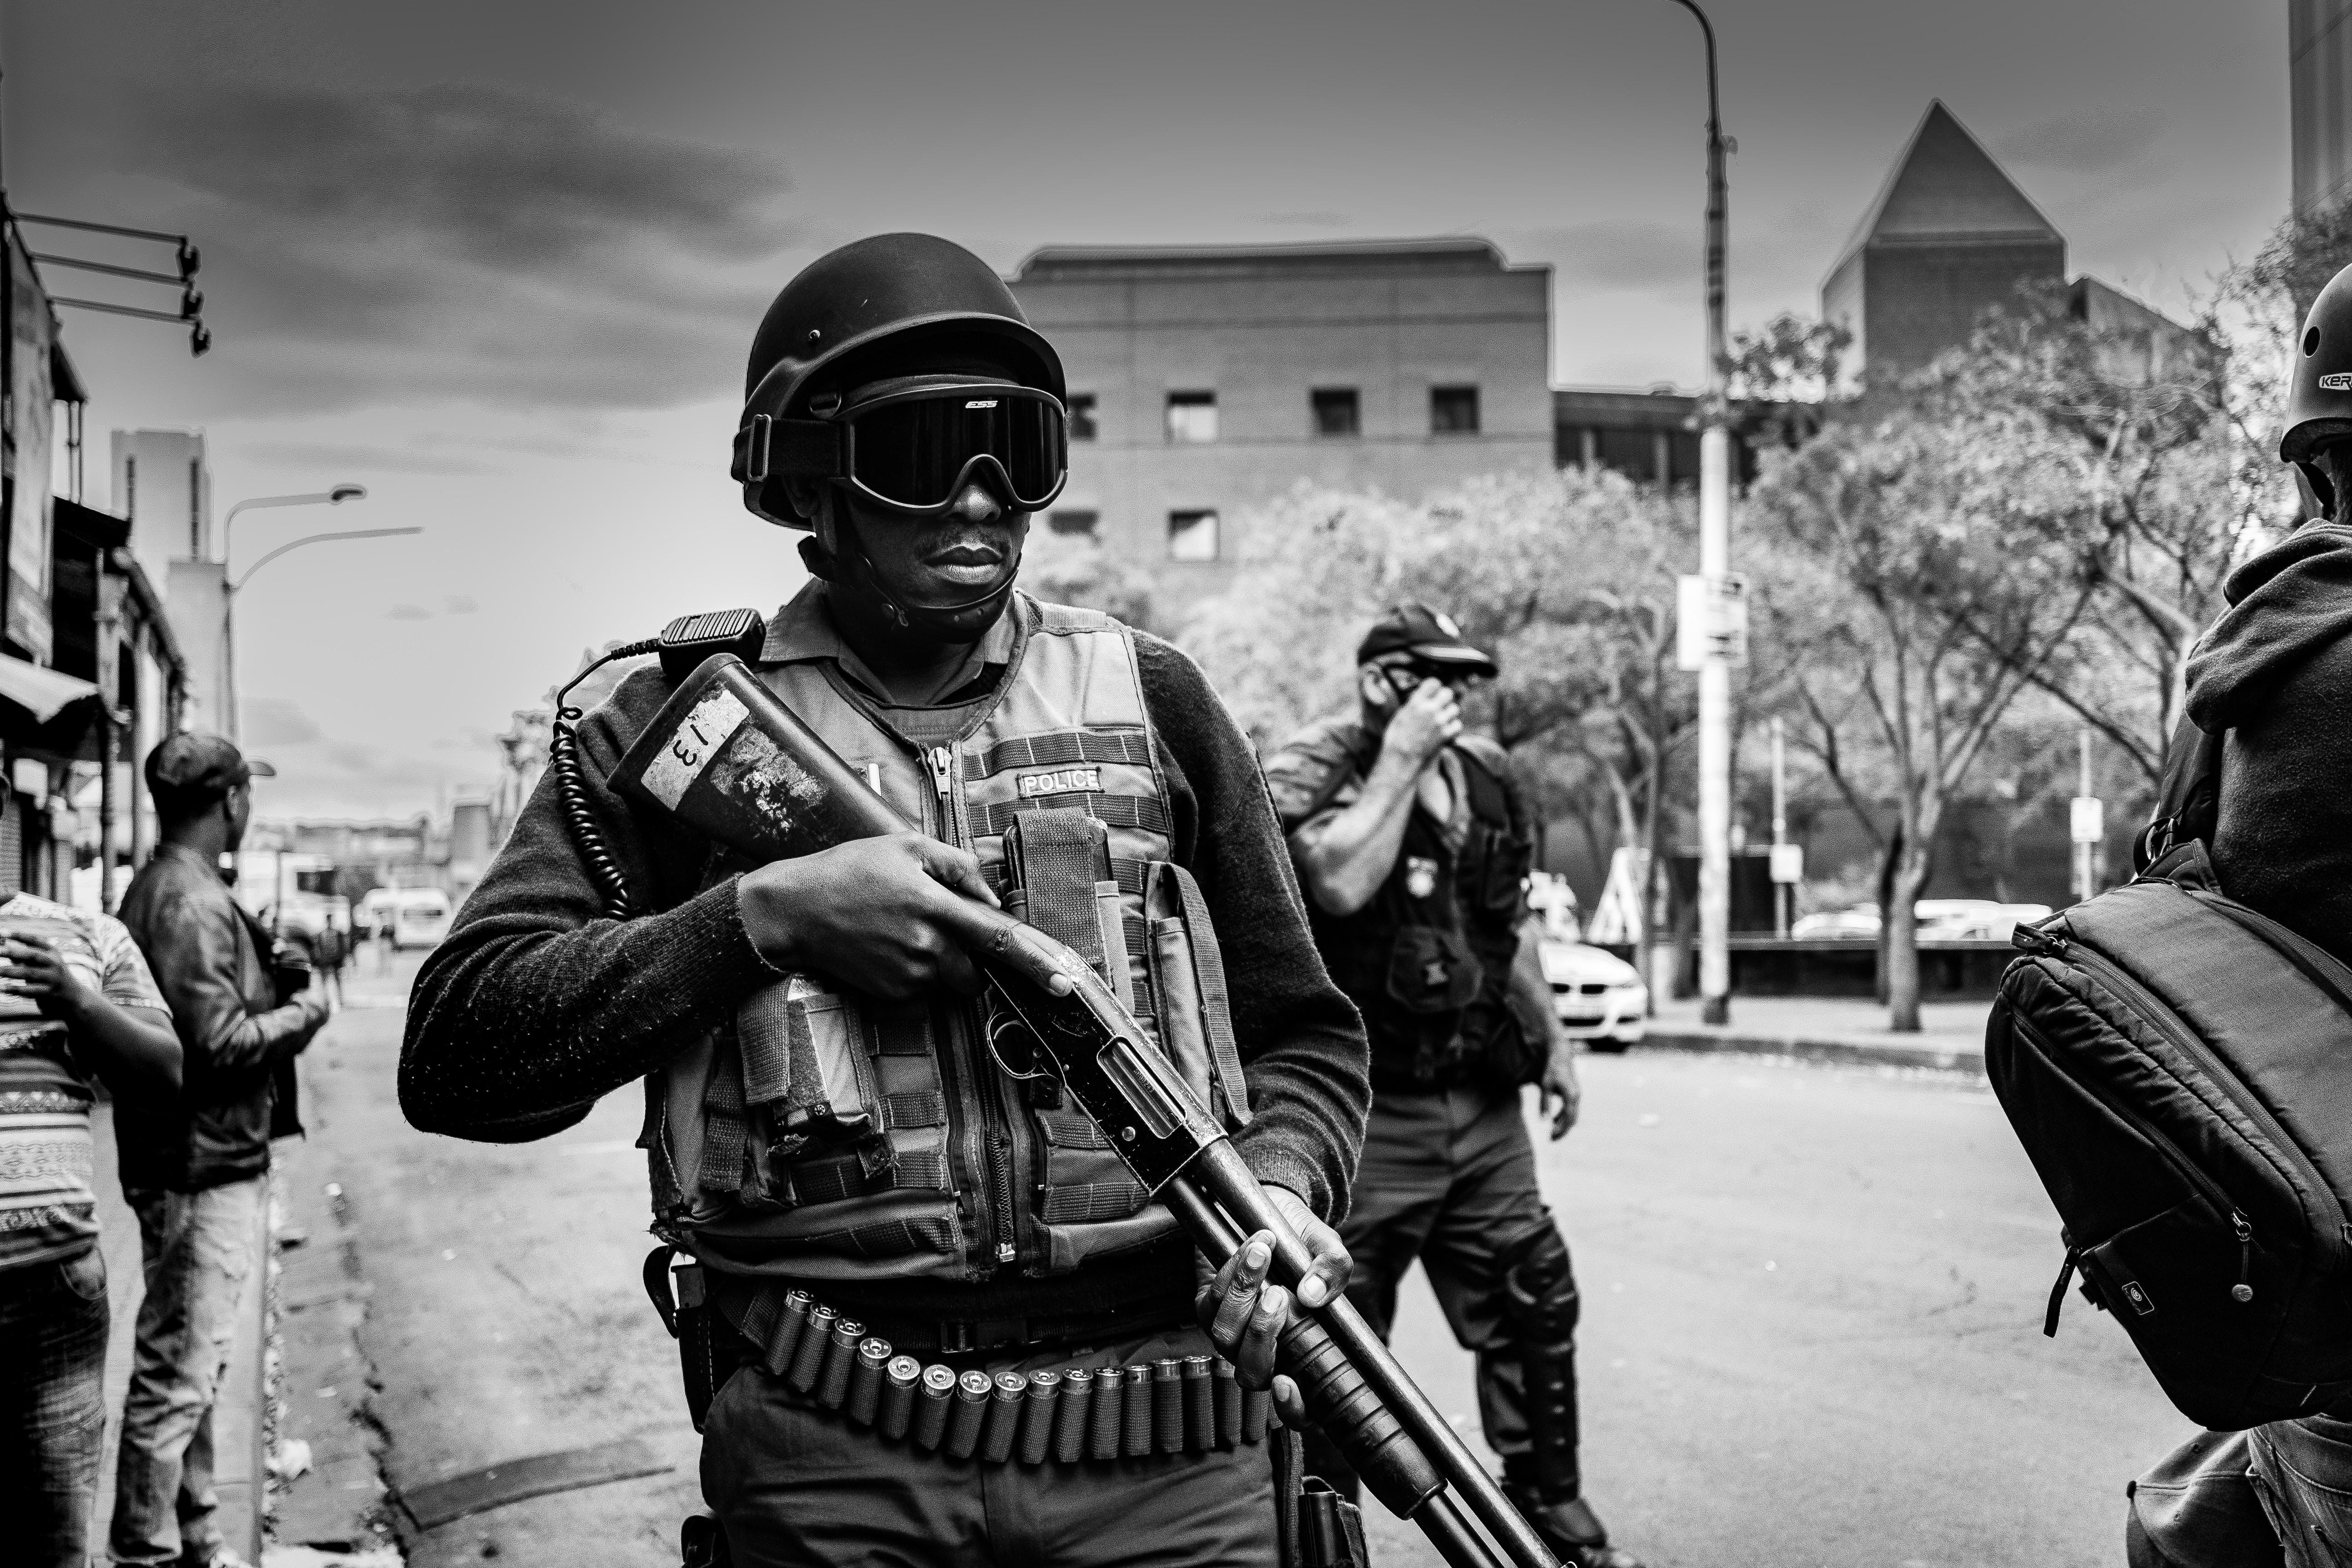 Predicting Urban Terrorism